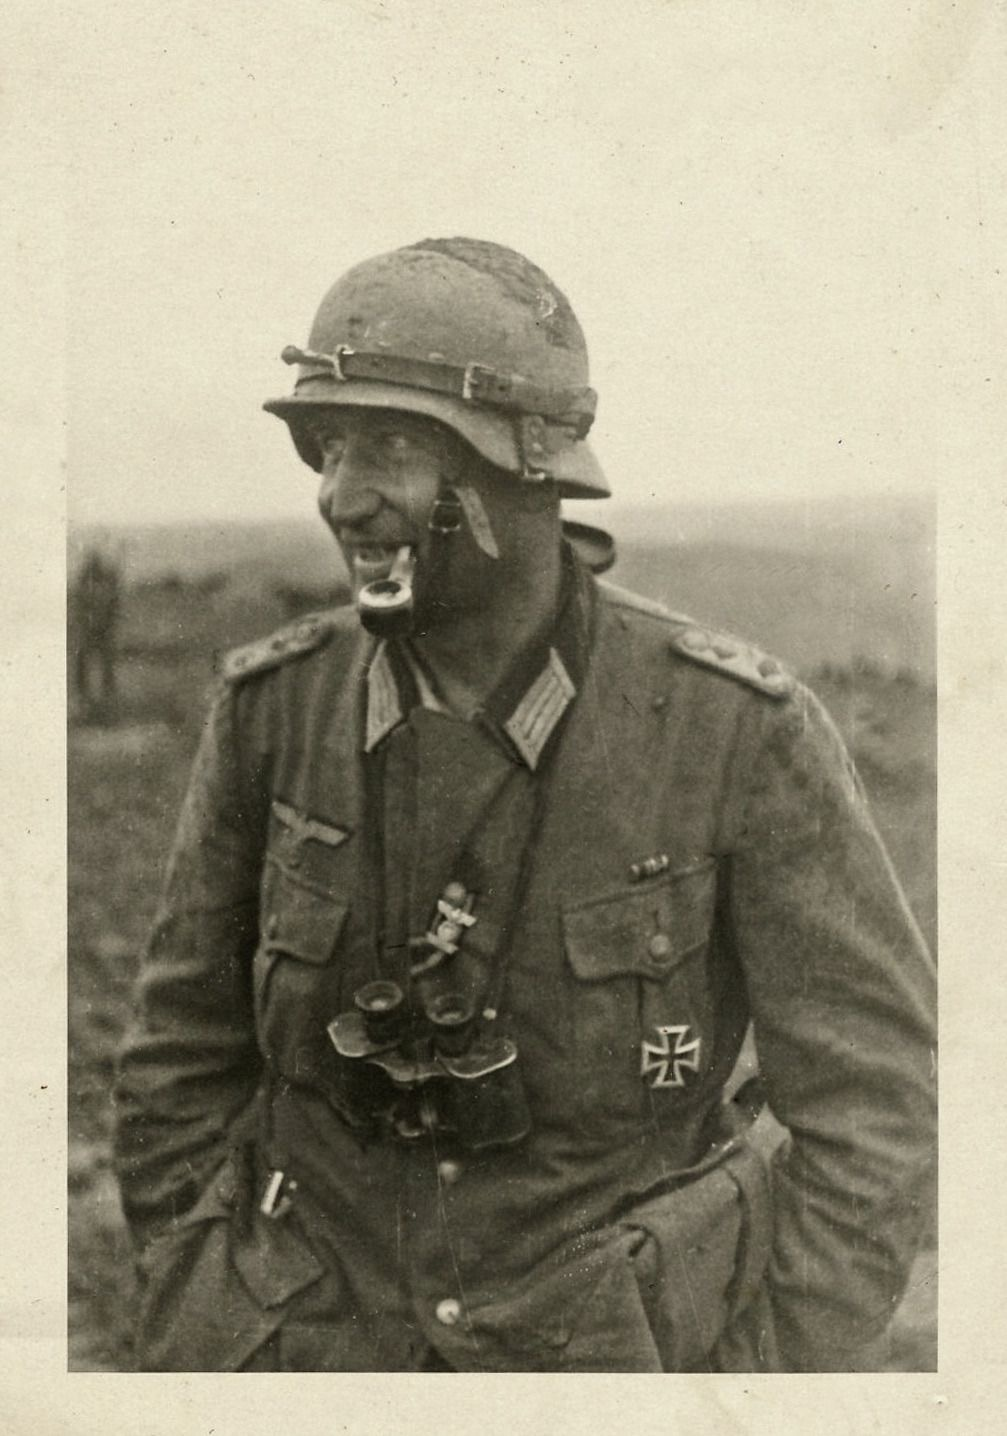 Diverses photos de la WWII - Page 40 67216